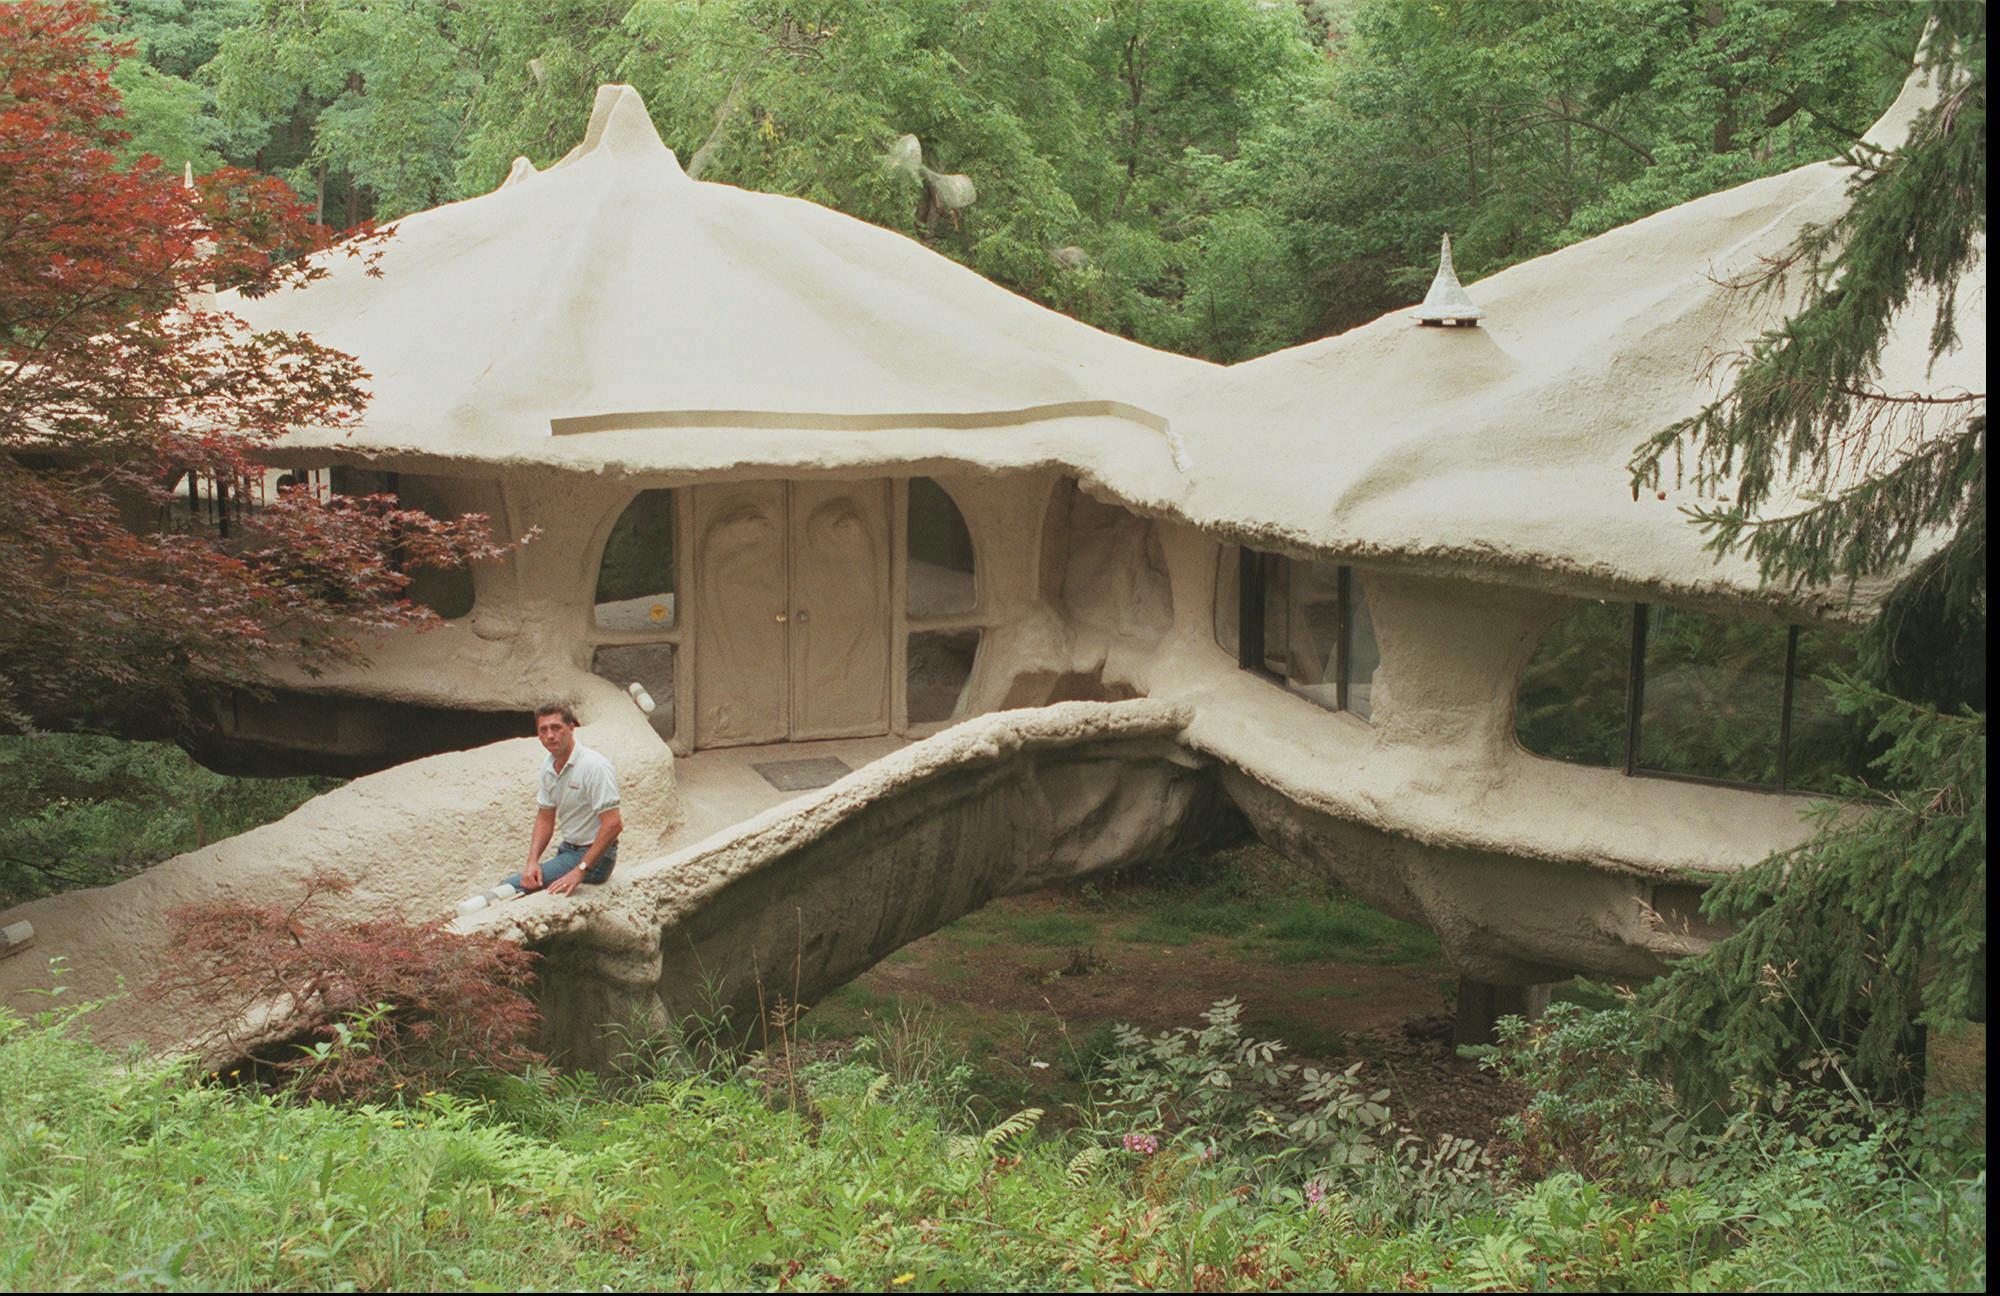 & Mushroom House asking price reduced